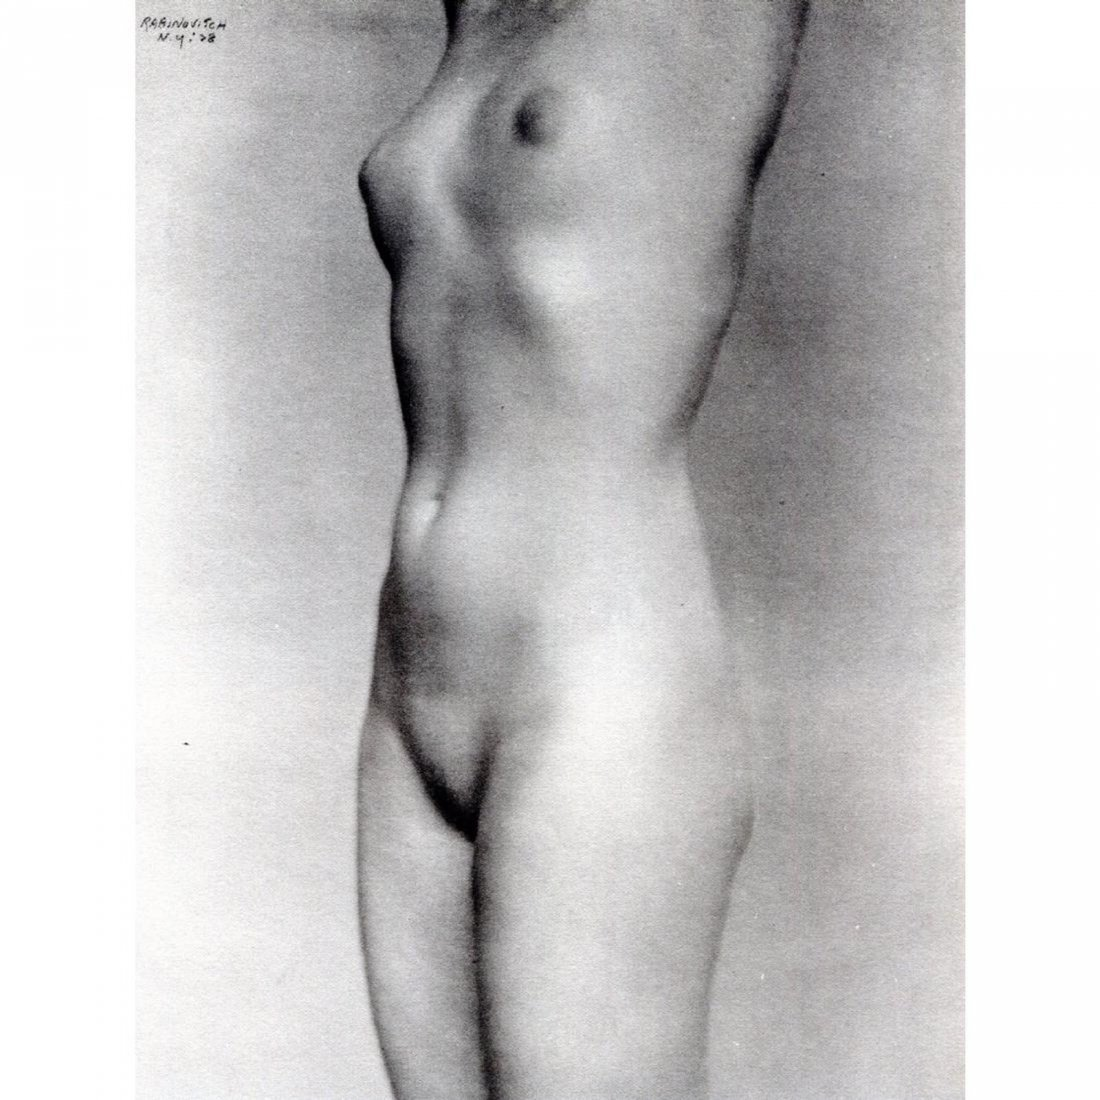 RABINOVITCH - Nude Torso